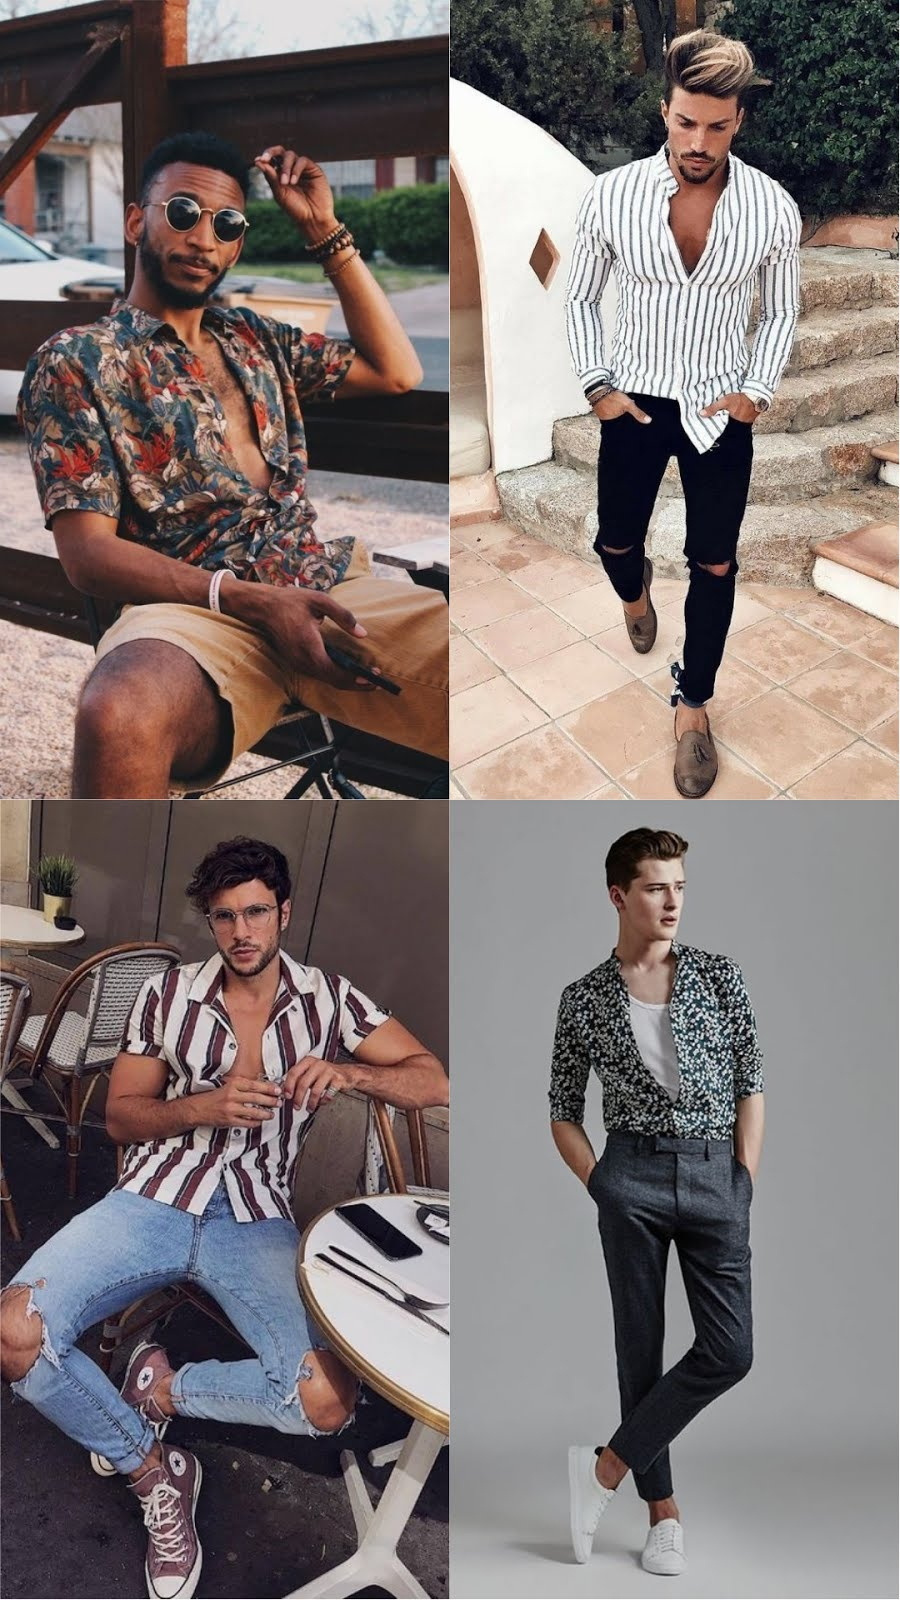 tendencias-moda-masculina-primavera-verao-2019-blog-tres-chic-look-camisa-botao-aberto